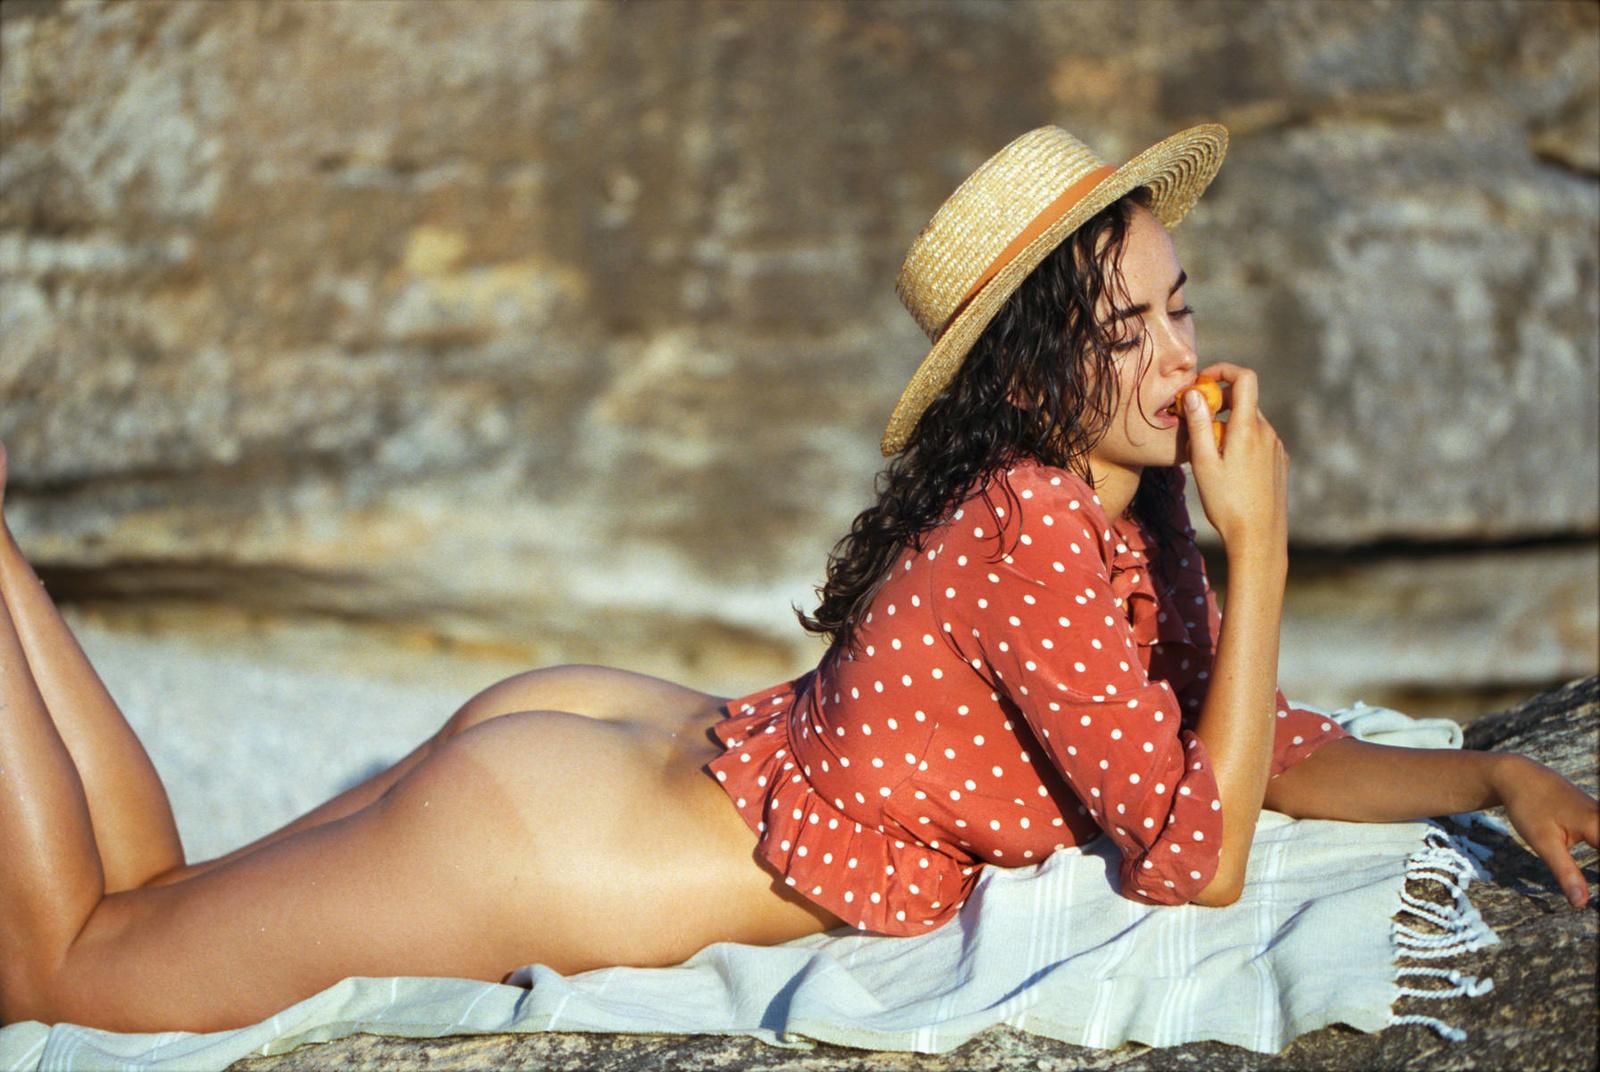 Implied nude snake photoshoot | photoshoot ideas